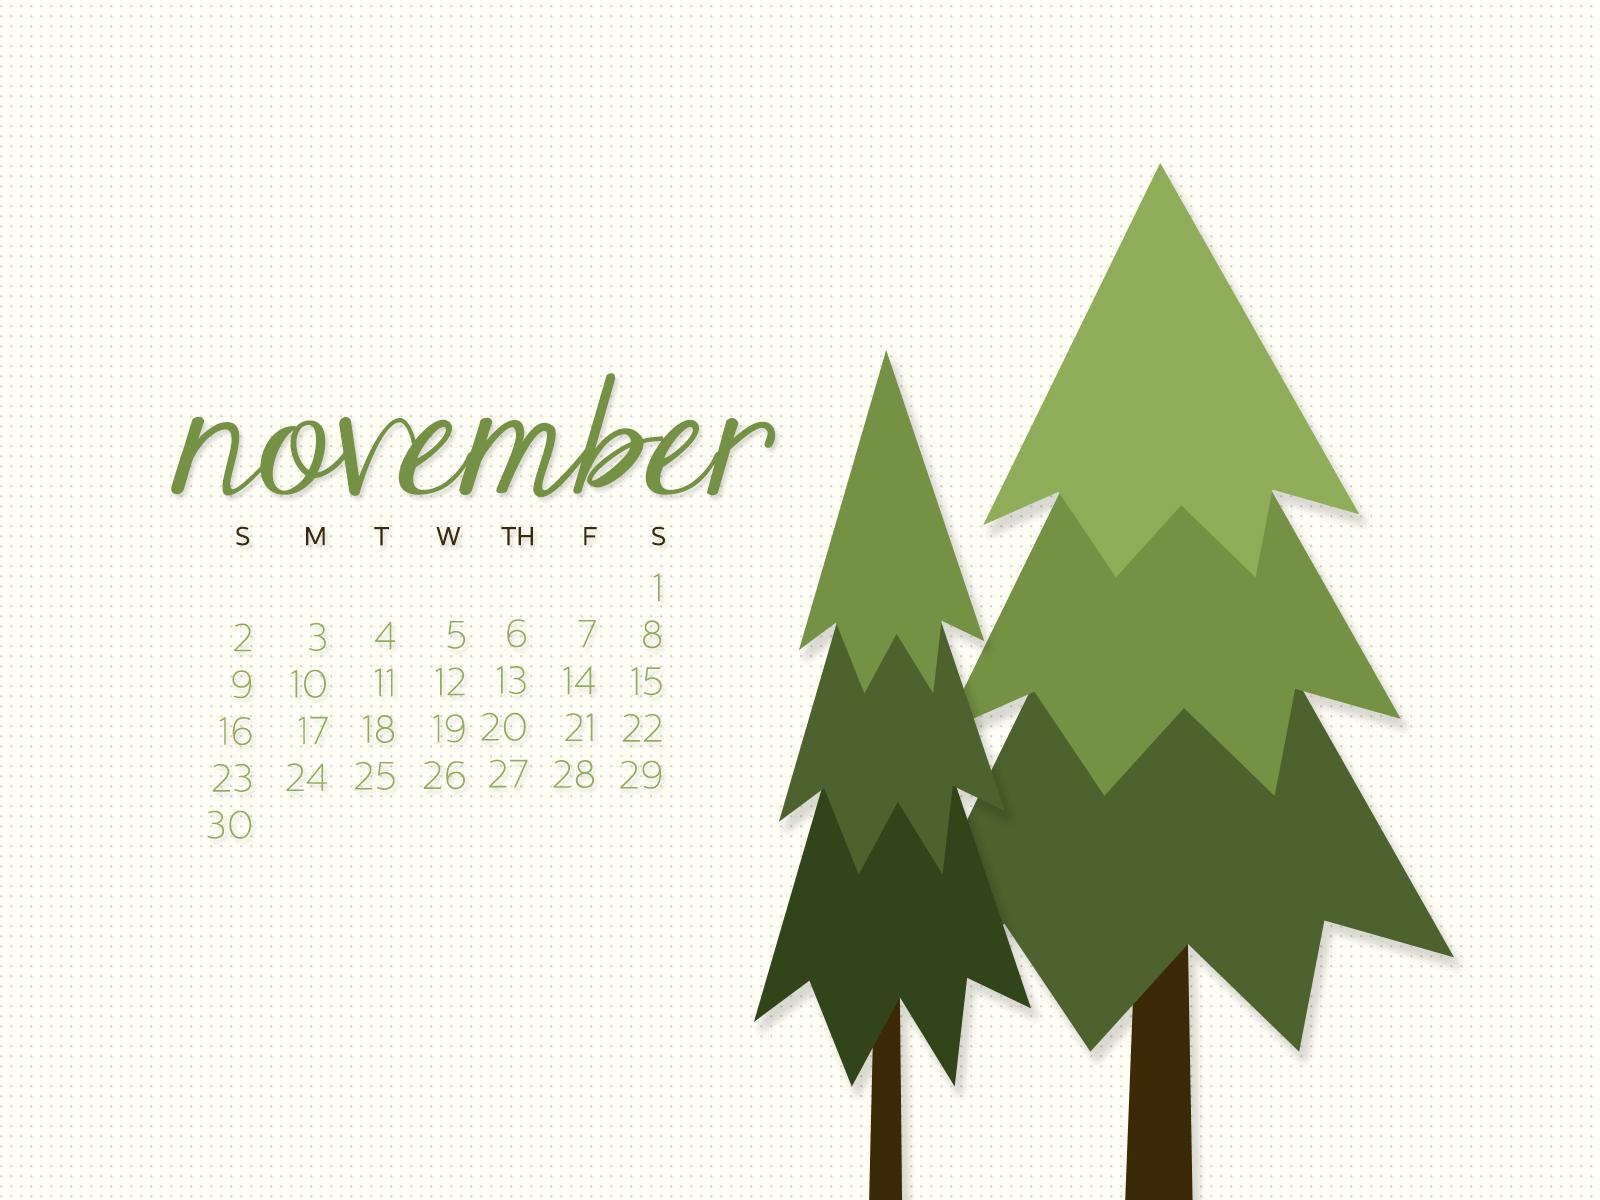 November 2014 Desktop Calendar Wallpaper